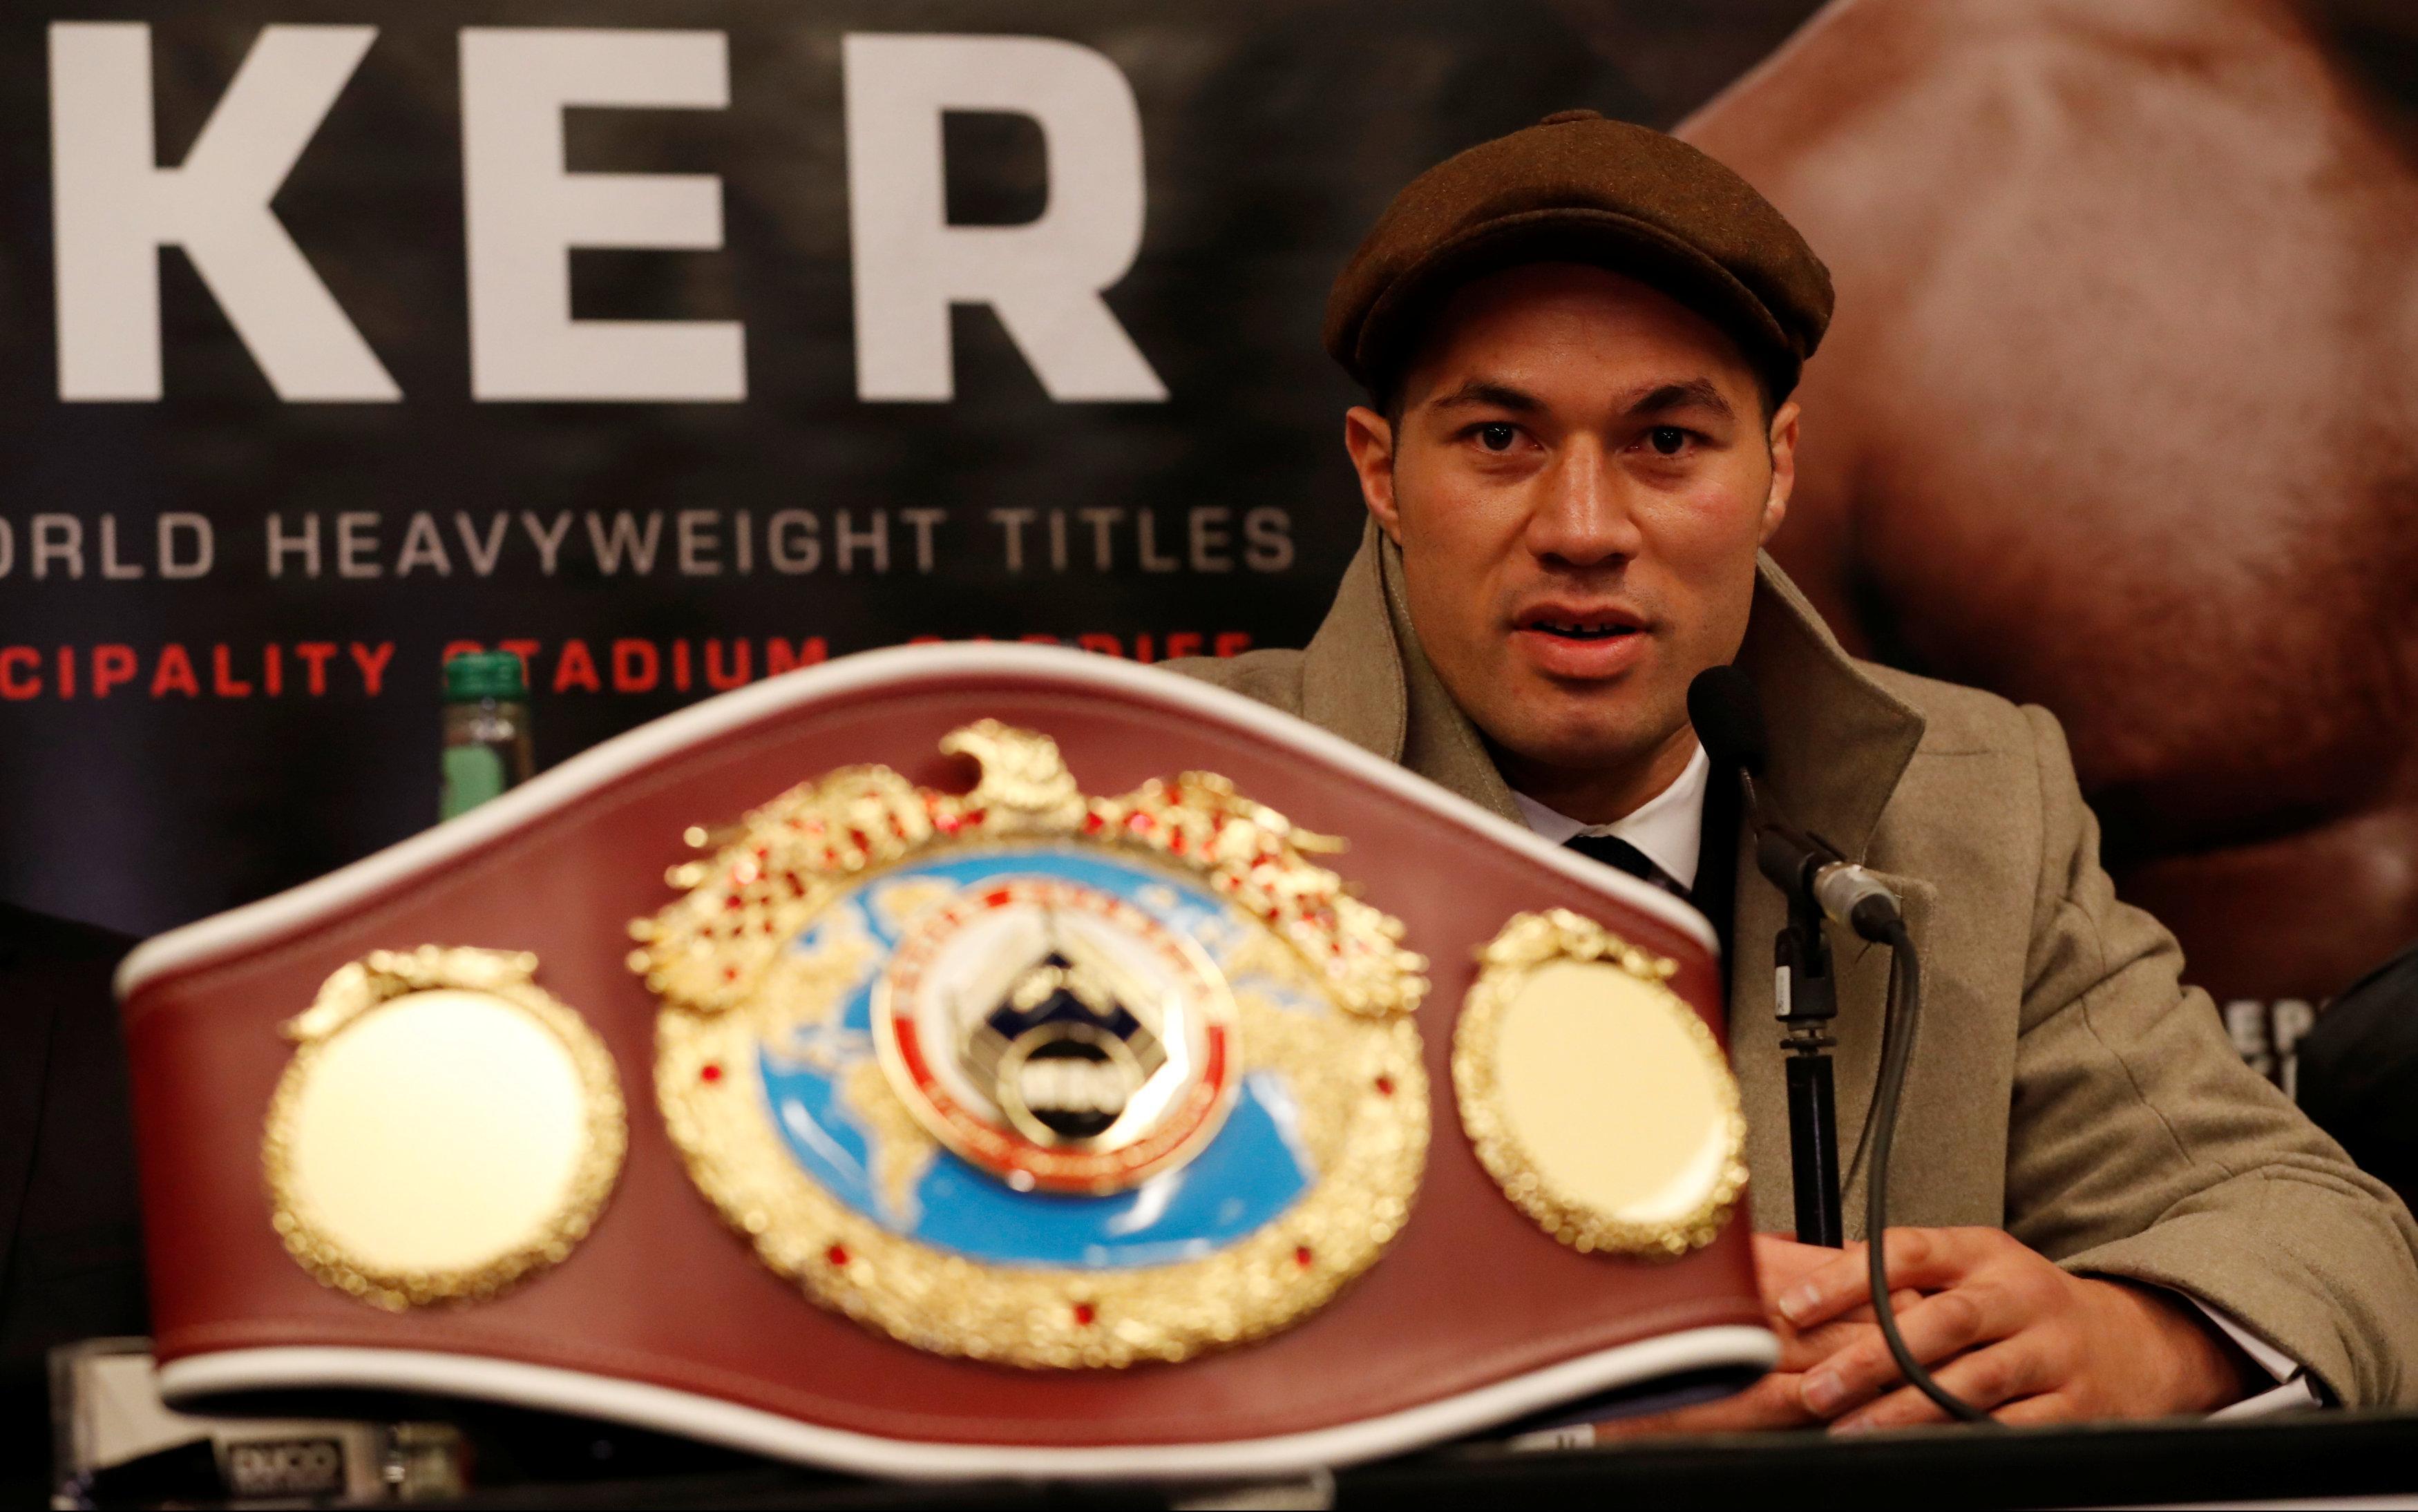 Joseph Parker beat Andy Ruiz in 2016 to be named the WBO heavyweight champion